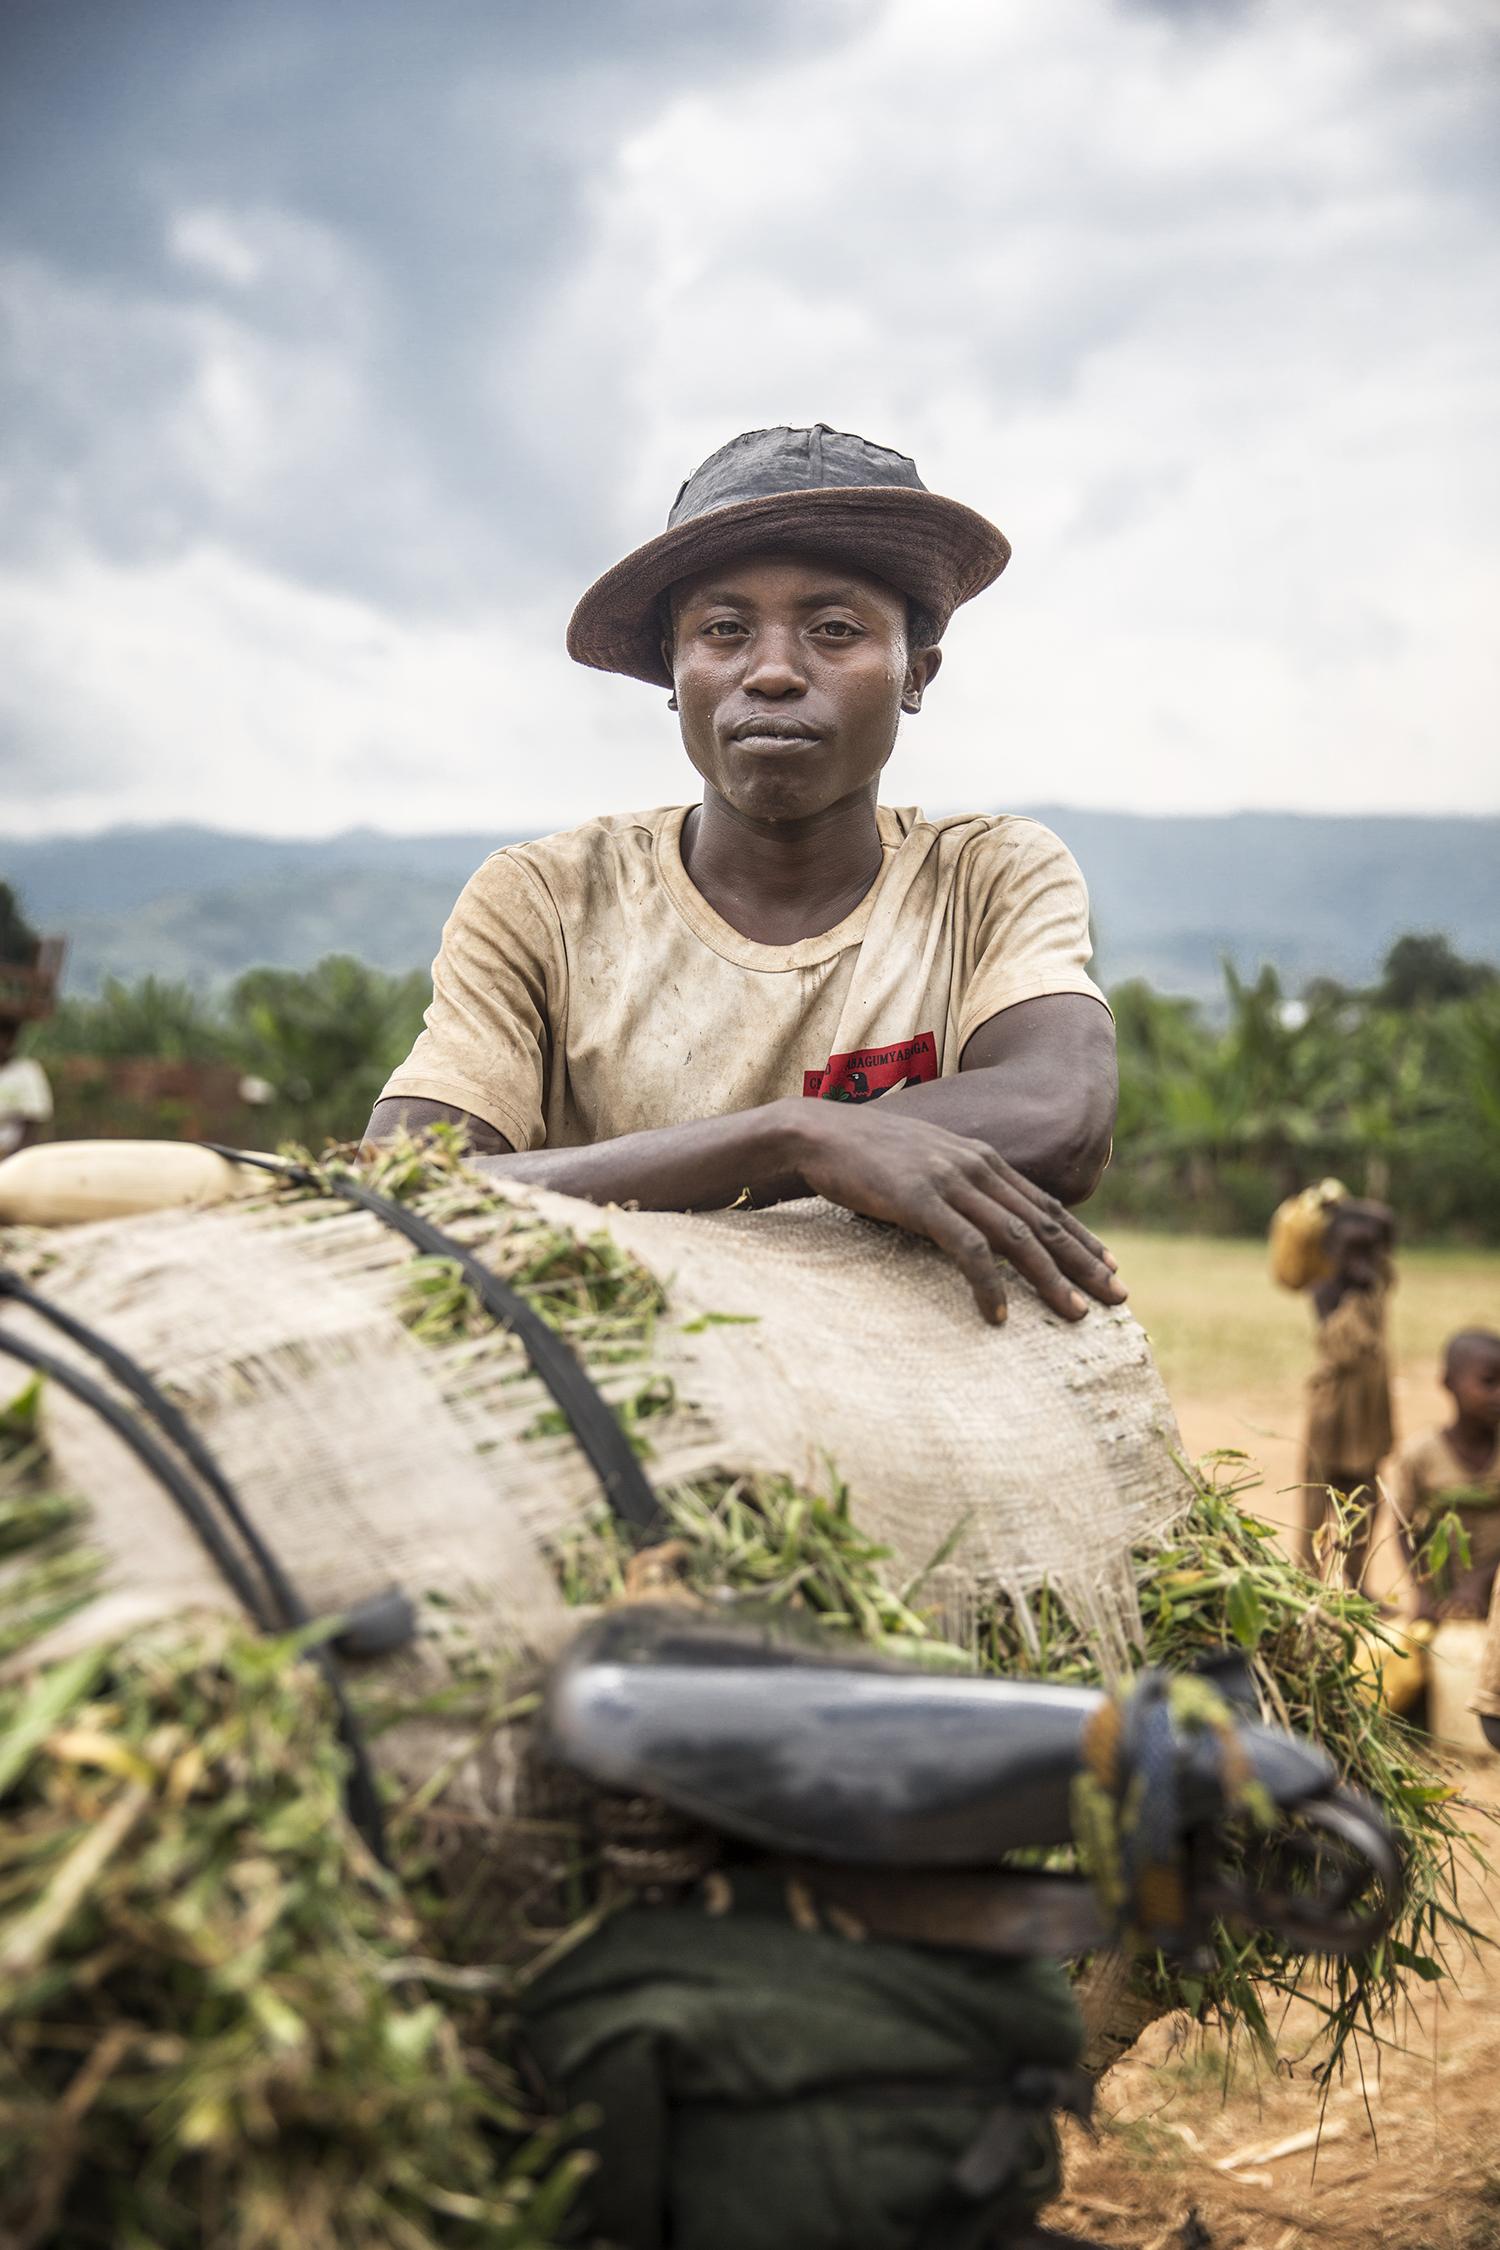 201606_Oxfam_Novib_Peace_Beyond_Borders_Burundi_Rwanda_Congo_DRC_Jeppe_Schilder_05.jpg